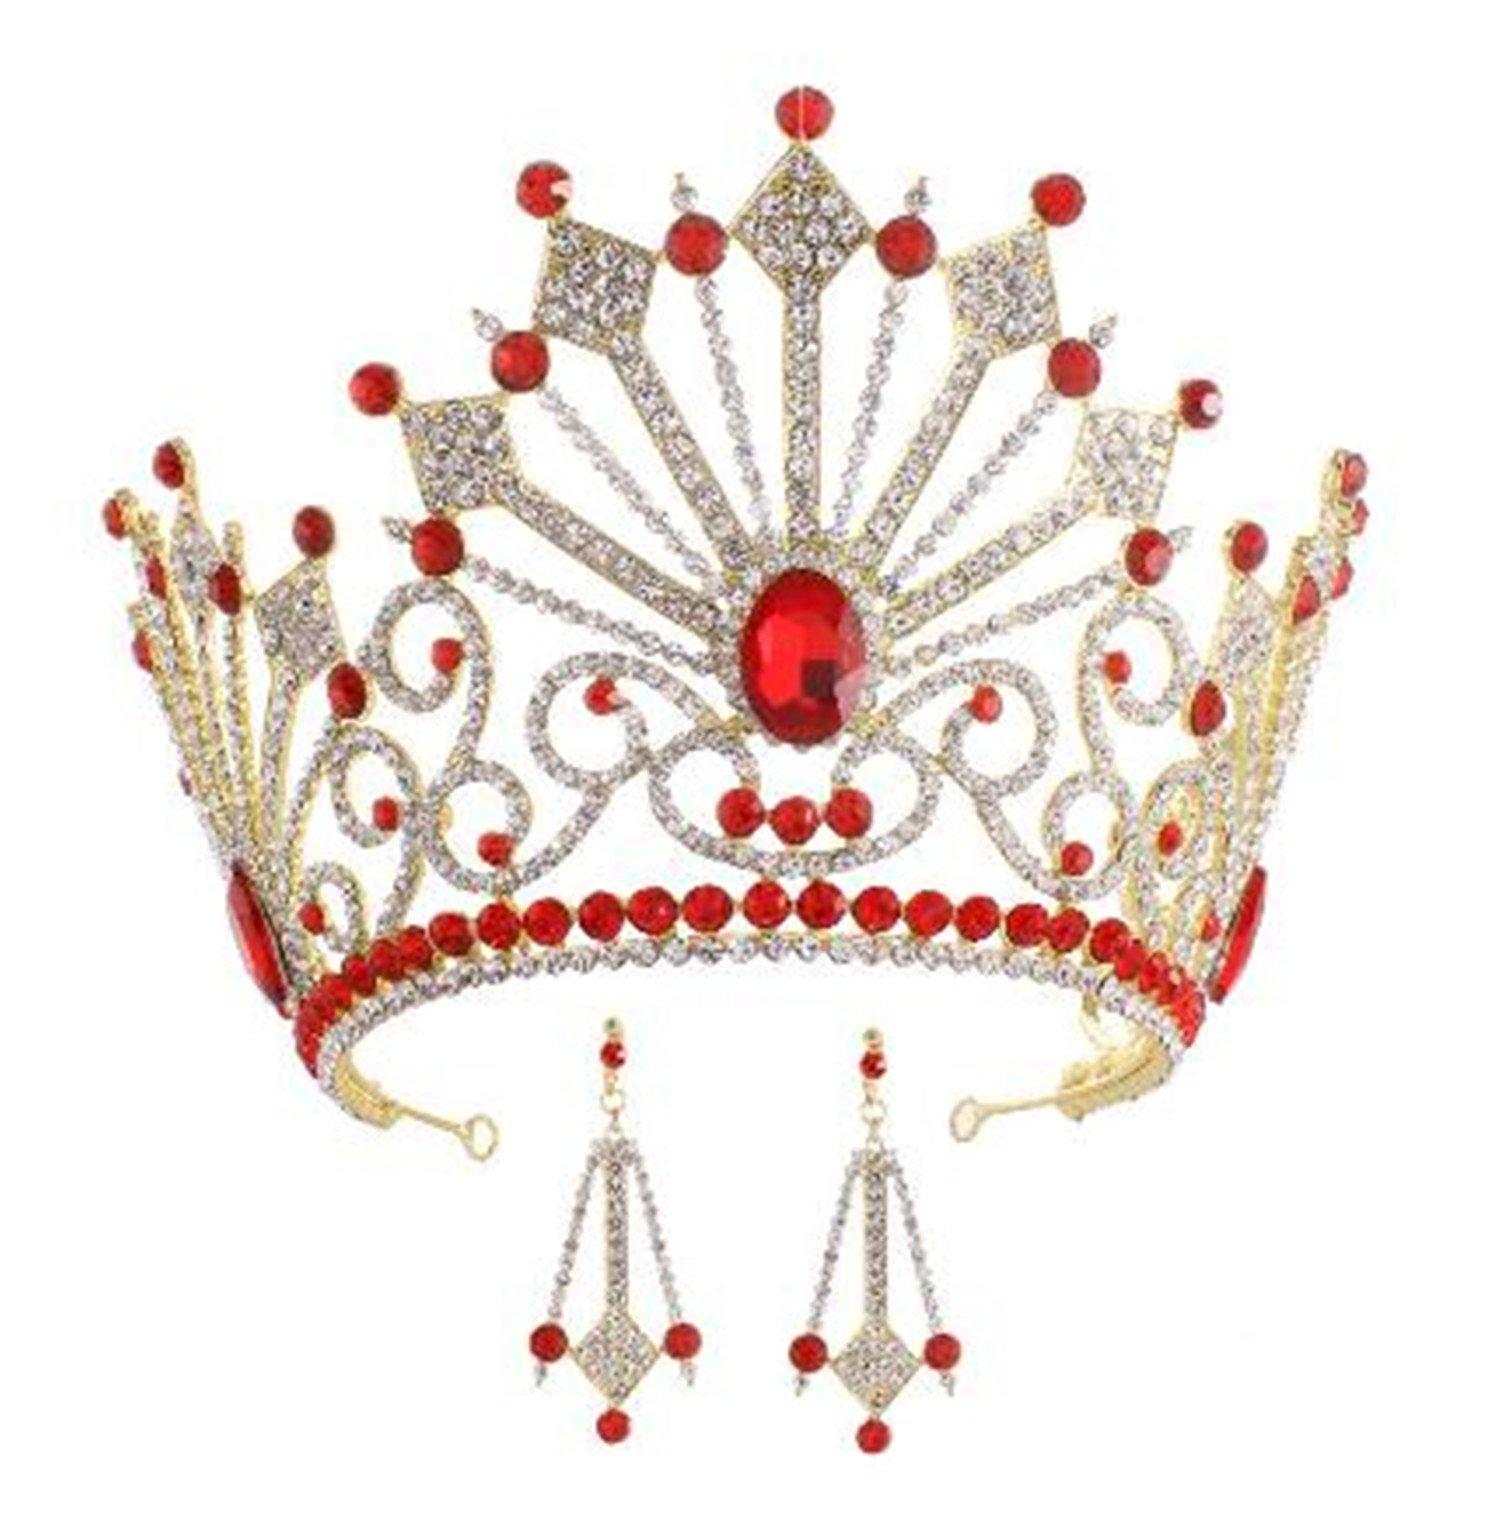 Wiipu Luxury Bridal Wedding Rhinestone Crystal Tall Crown Oversize Headbands Tiaras(A1233) (Red) by wiipujewelry